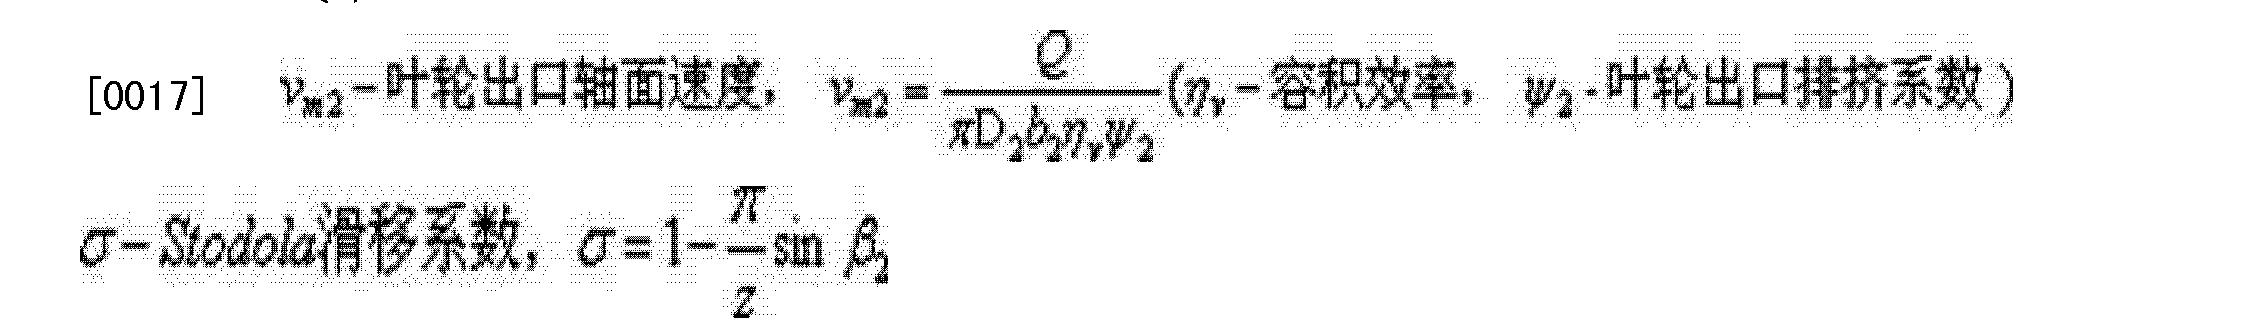 Figure CN203685691UD00045